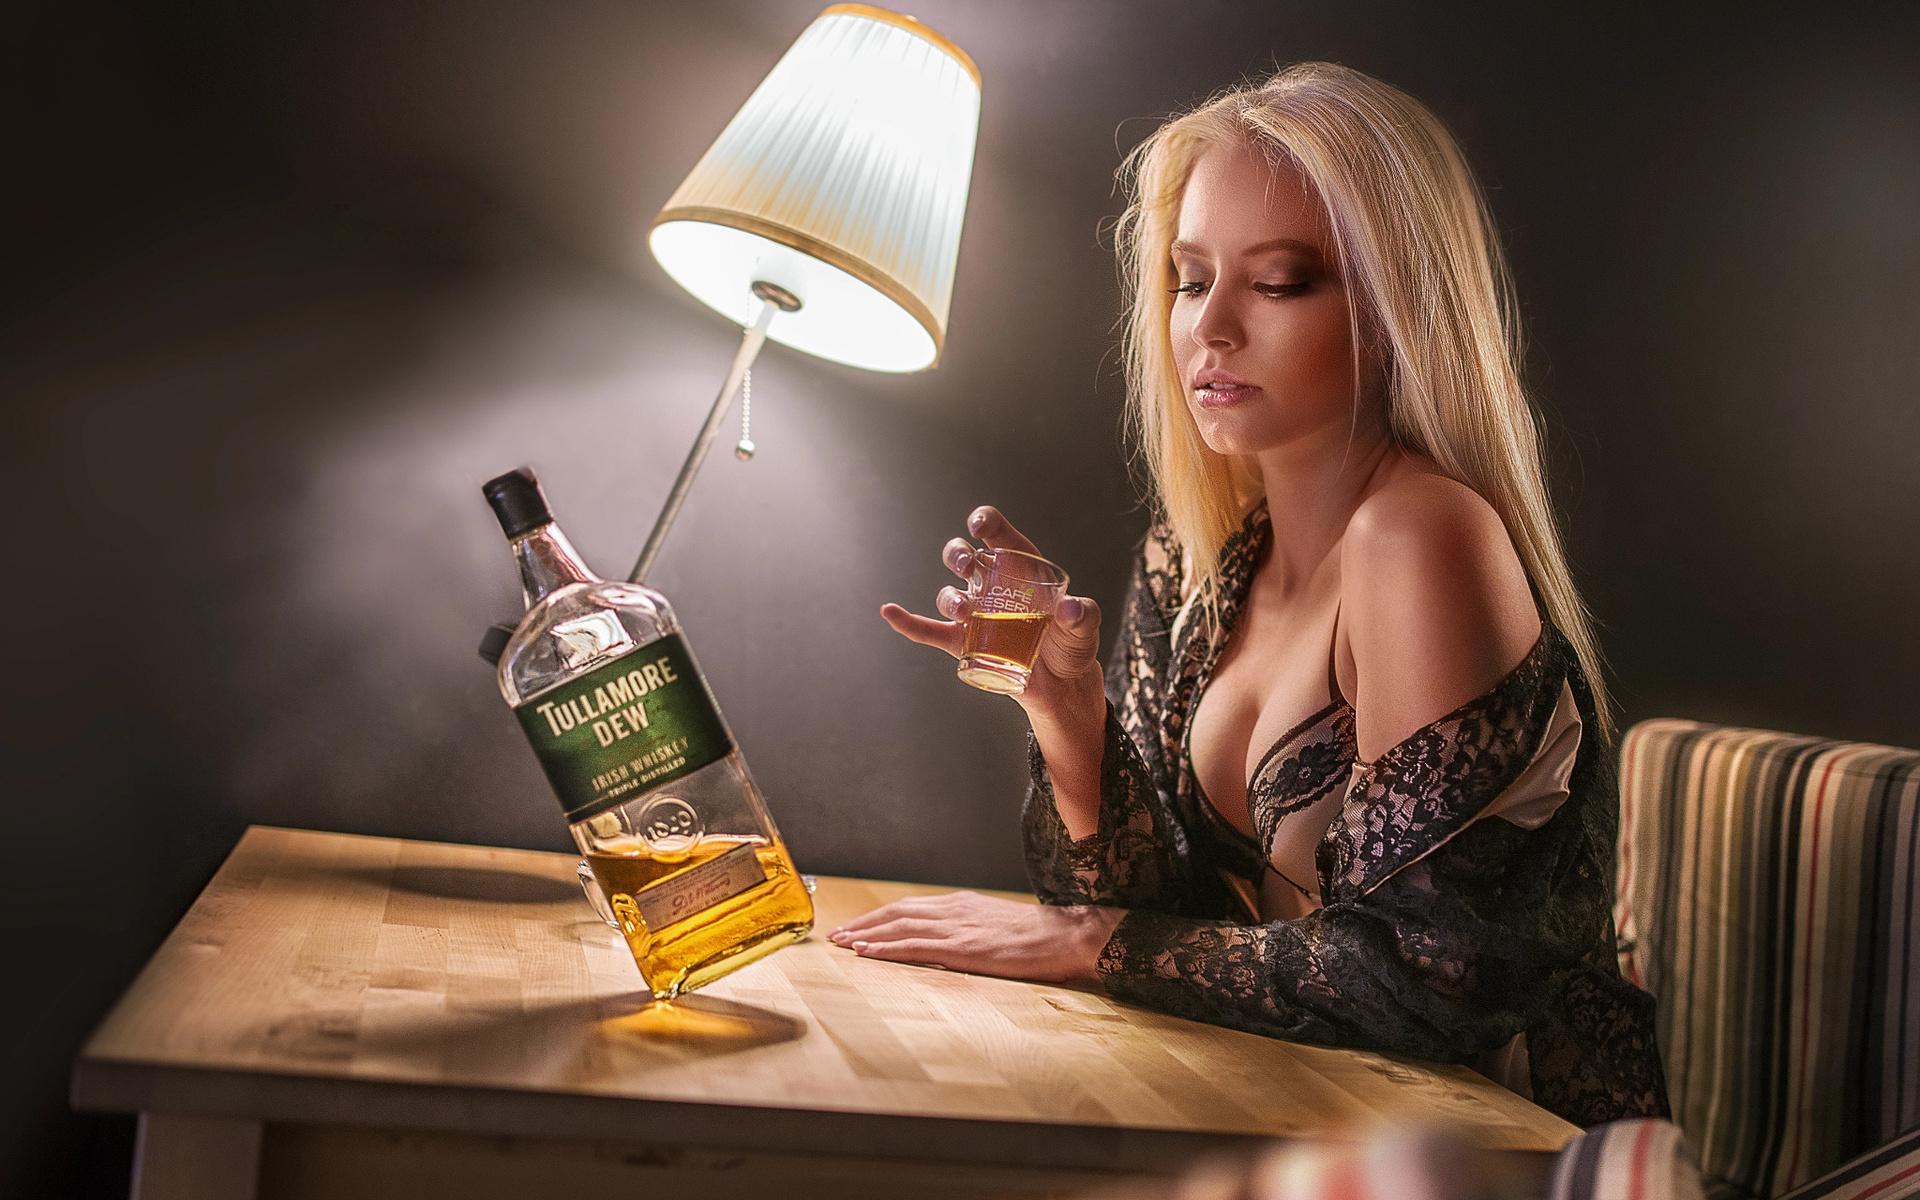 Картинки с виски и девушкой, картинки фотошоп